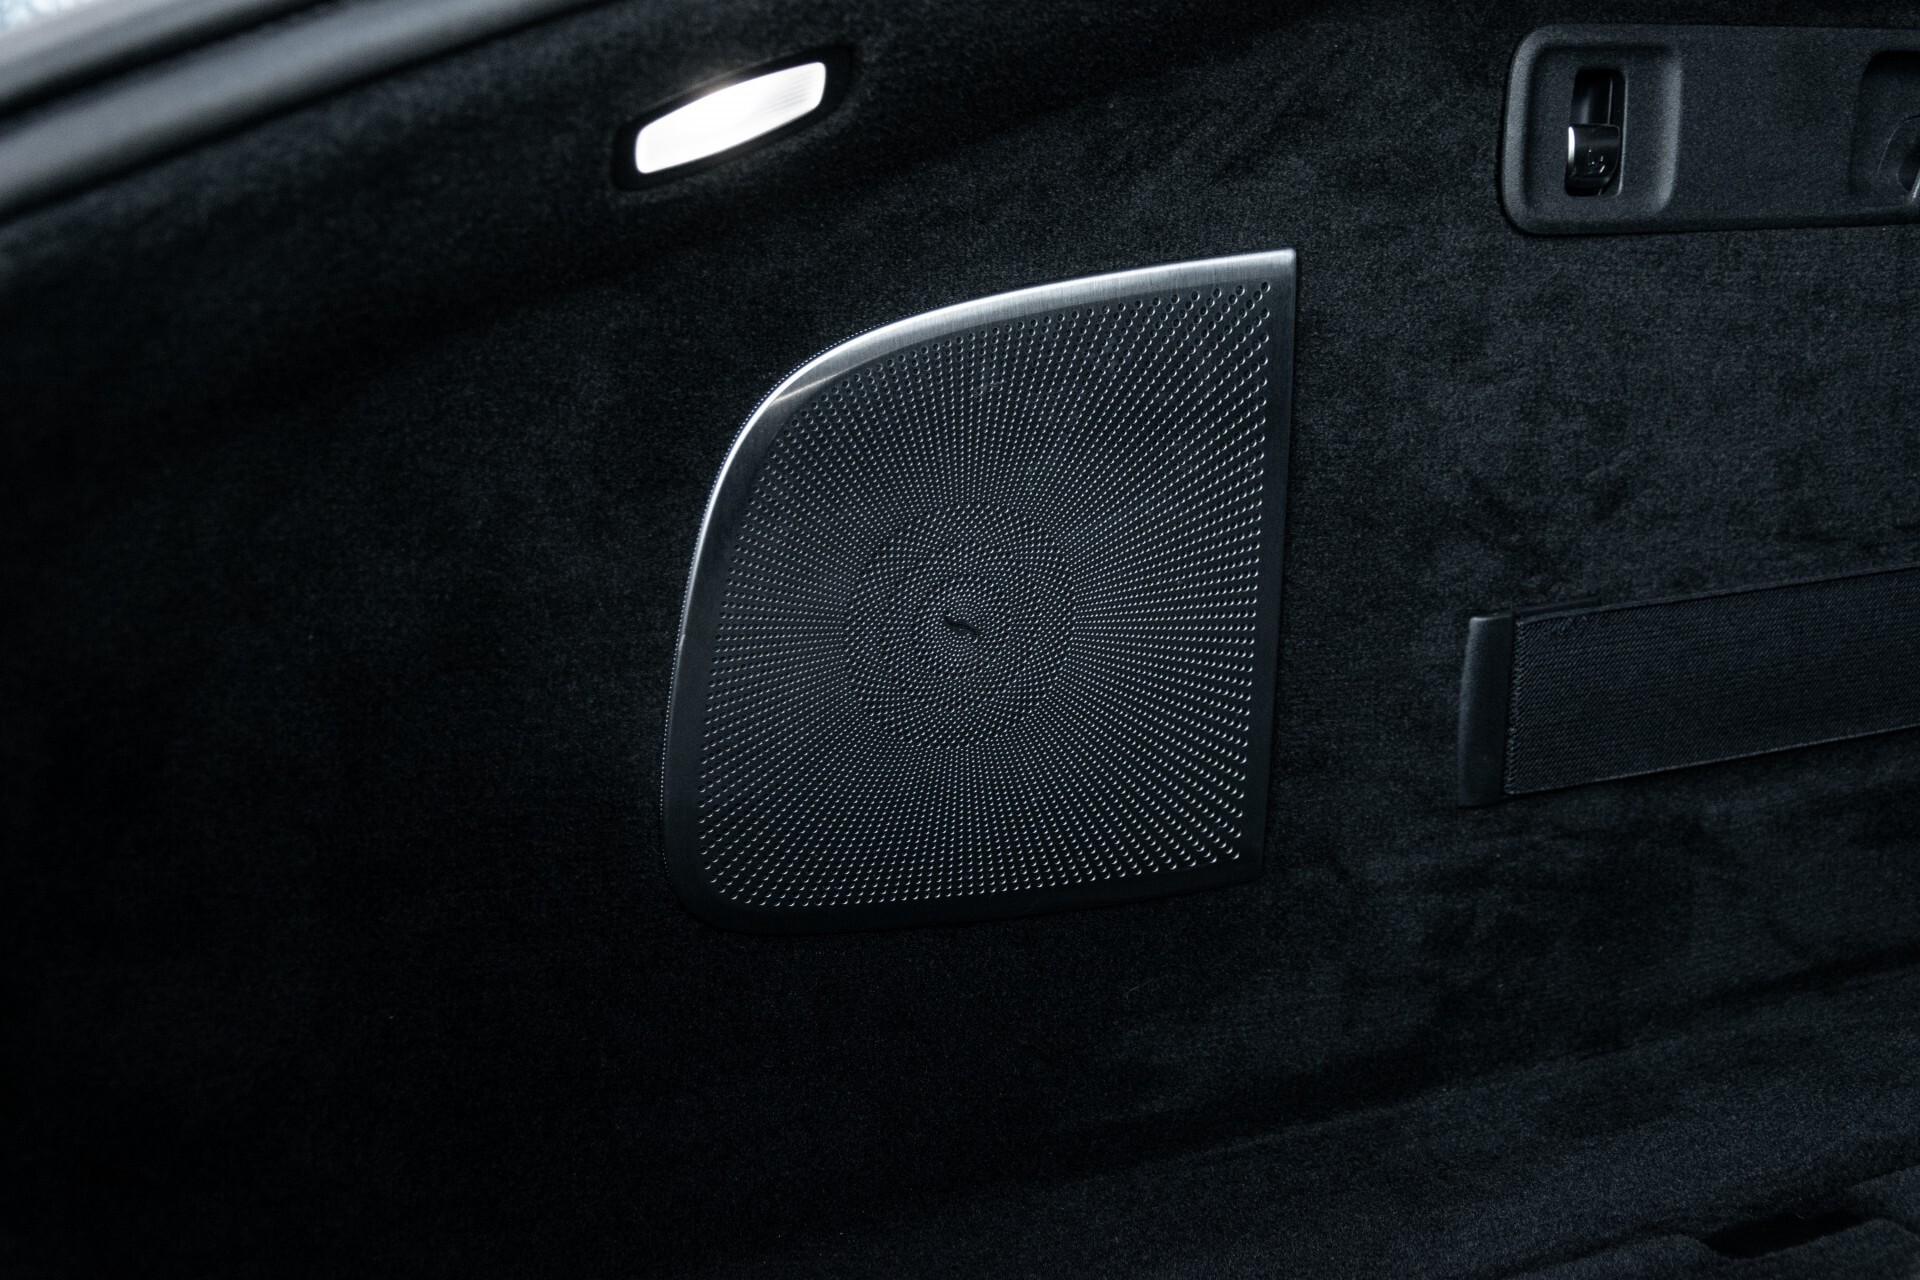 Mercedes-Benz AMG GT 4-Door Coupe 63 S 4MATIC+ Edition 1 Keramisch/Carbon/First Class/Dynamic Plus/Burmester High End 3D Aut9 Foto 78